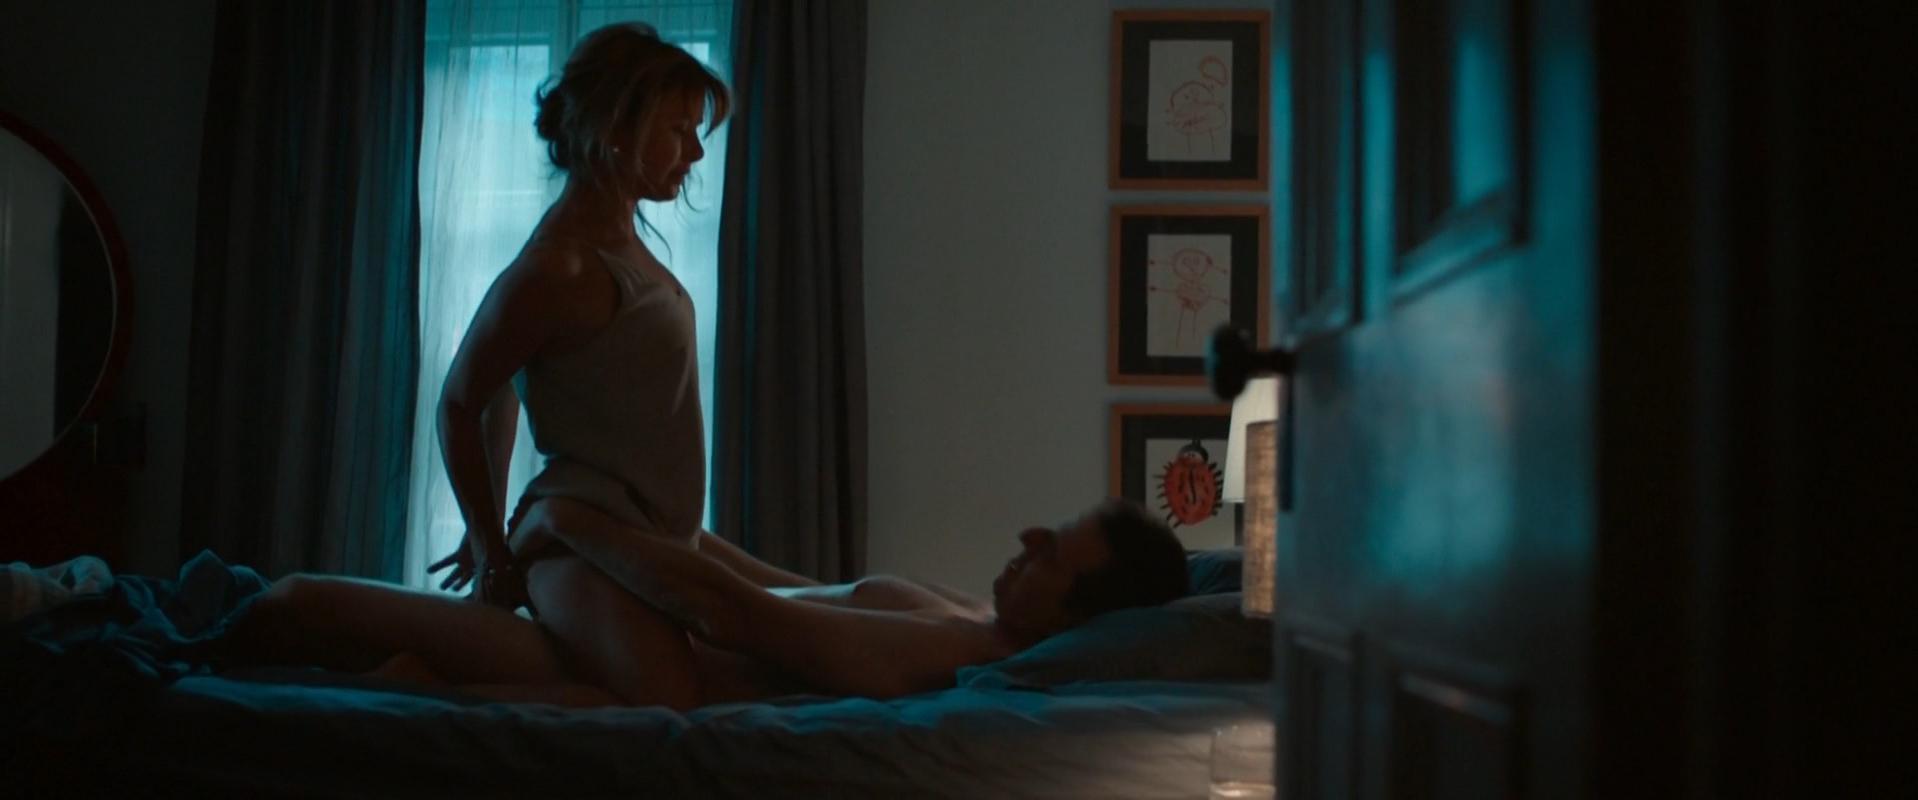 Isabel Richer sexy, Ayana O'Shun sexy - Les 3 p'tits cochons 2 (2016)